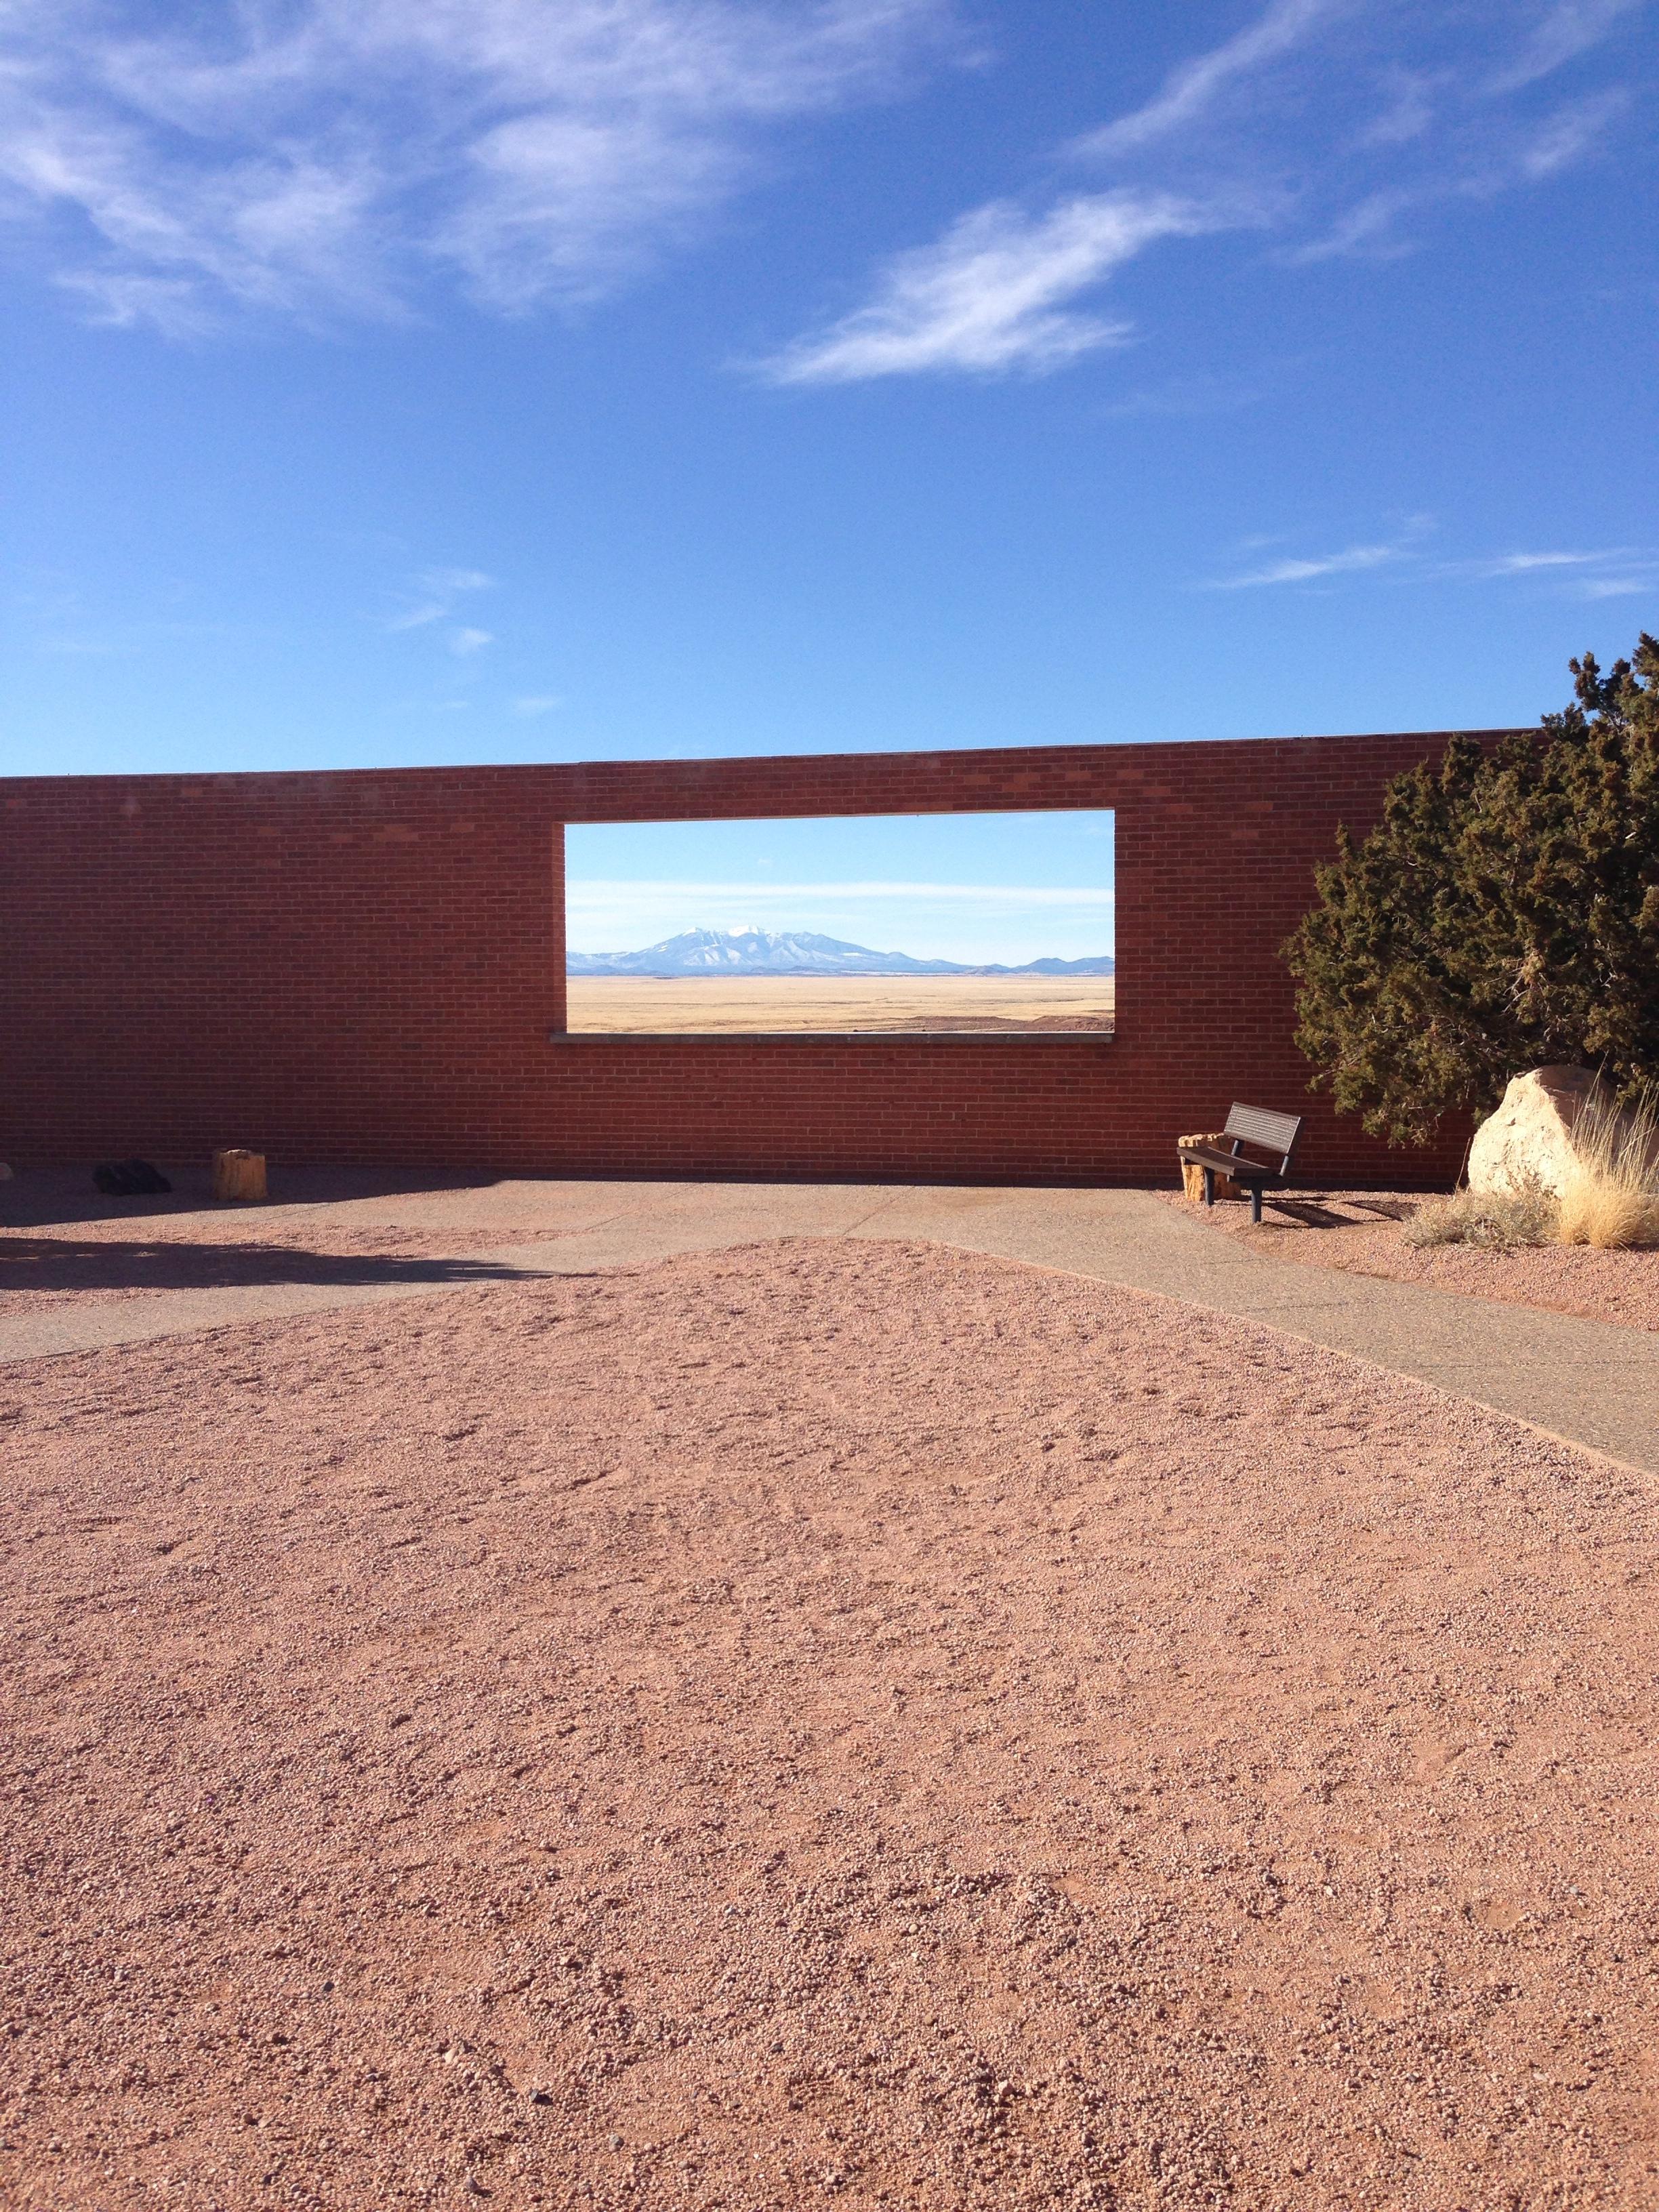 A glimps into the future or past at Meteor Creator Arizona.  Copyright © 2013 Mason Hayutin